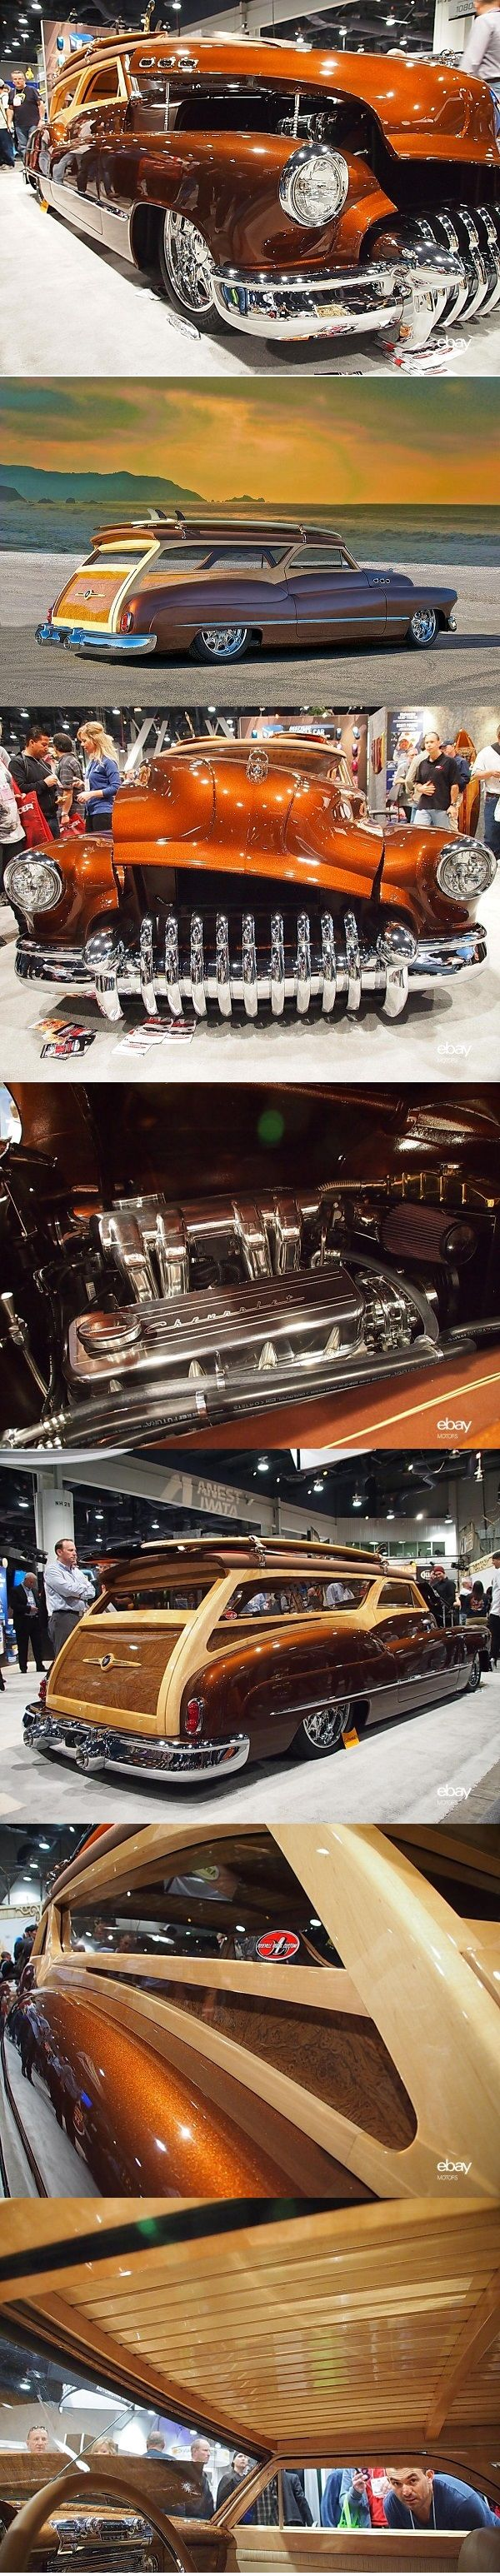 ◆ Visit ~ MACHINE Shop Café ◆ (1950 Buick 'Low Tide' Custom Woody Wagon of Scott Pruett)